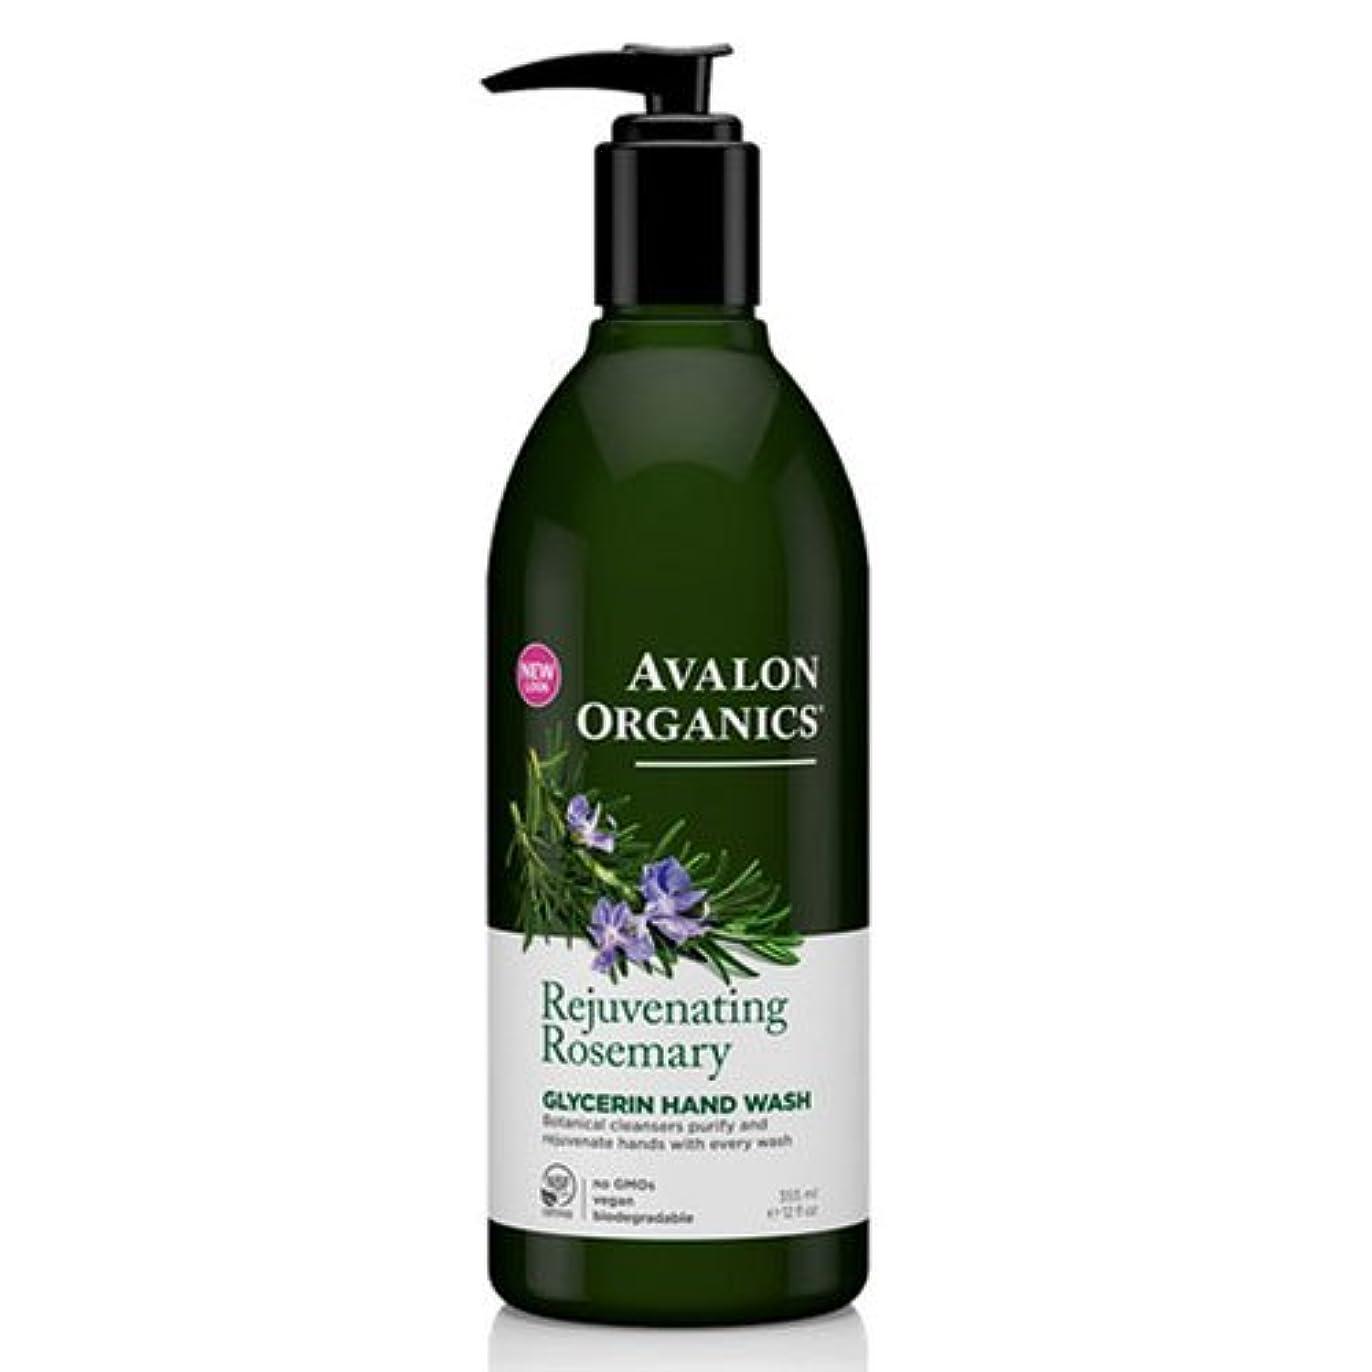 生理輸血忠実海外直送品Avalon Organics Hand Soap Glycerin, Rosemary 12 Oz (Pack of 6)